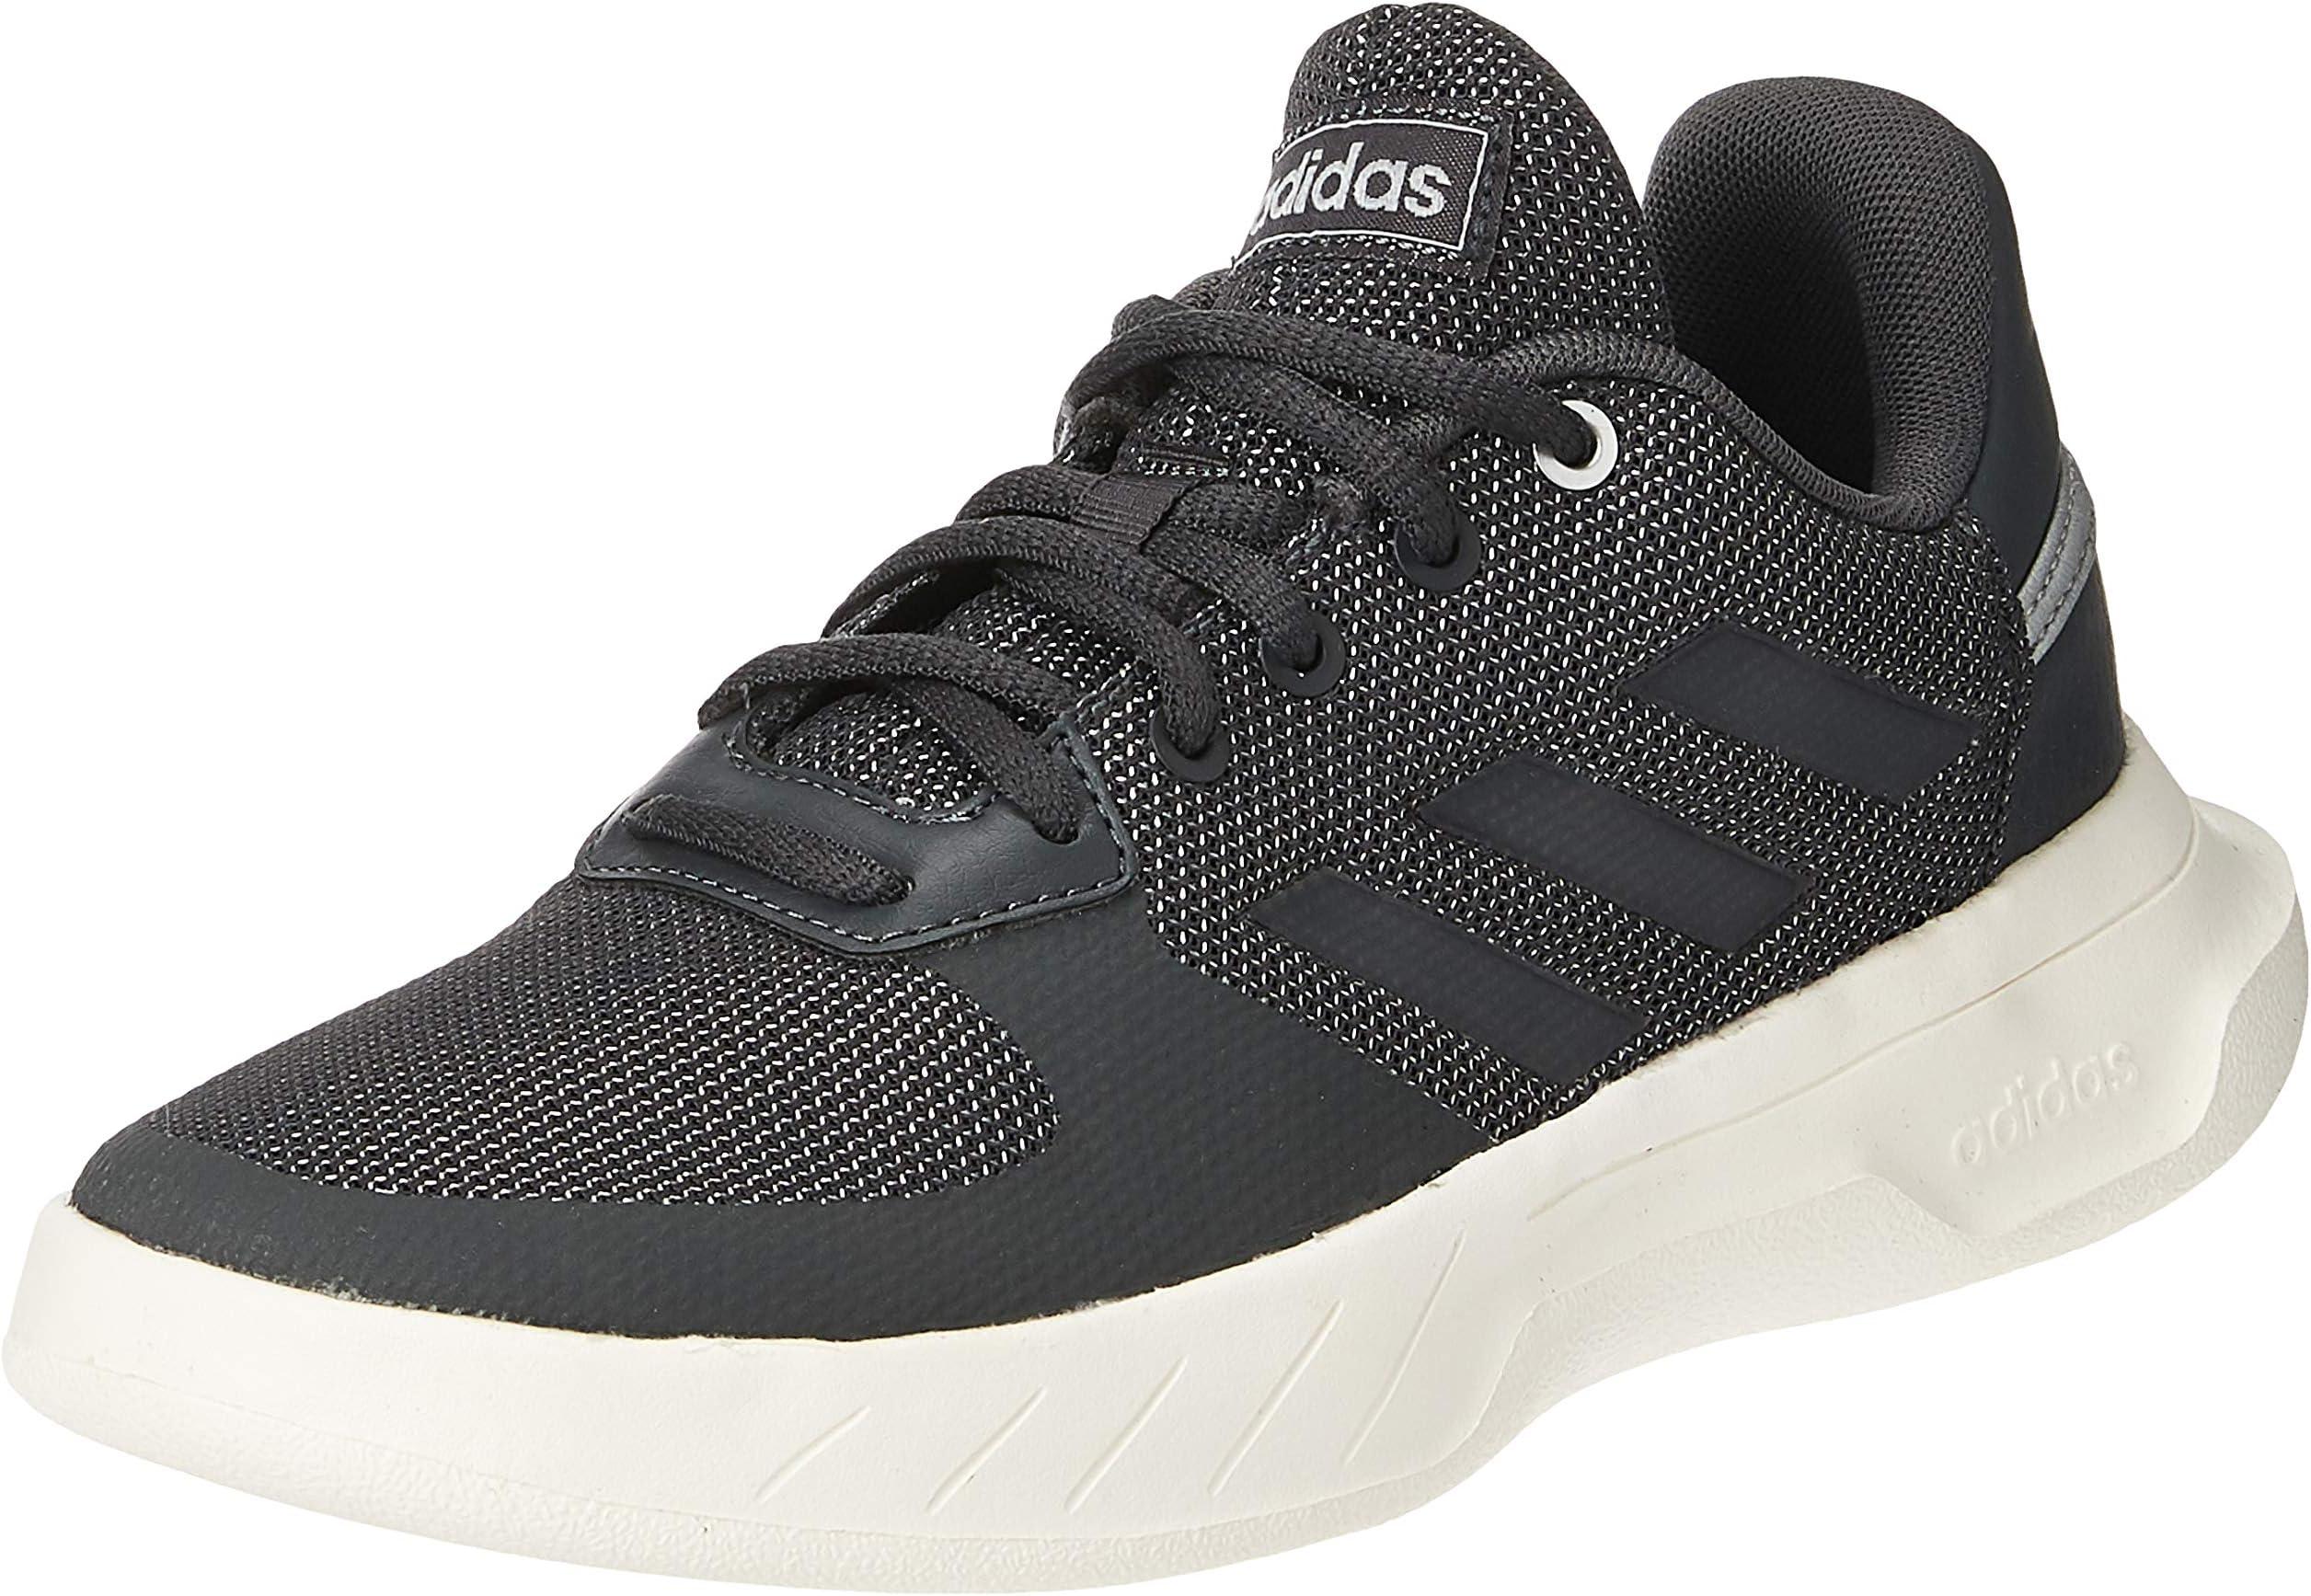 Trampas Lubricar danza  adidas fusion flow shoes price in UAE | Amazon UAE | kanbkam